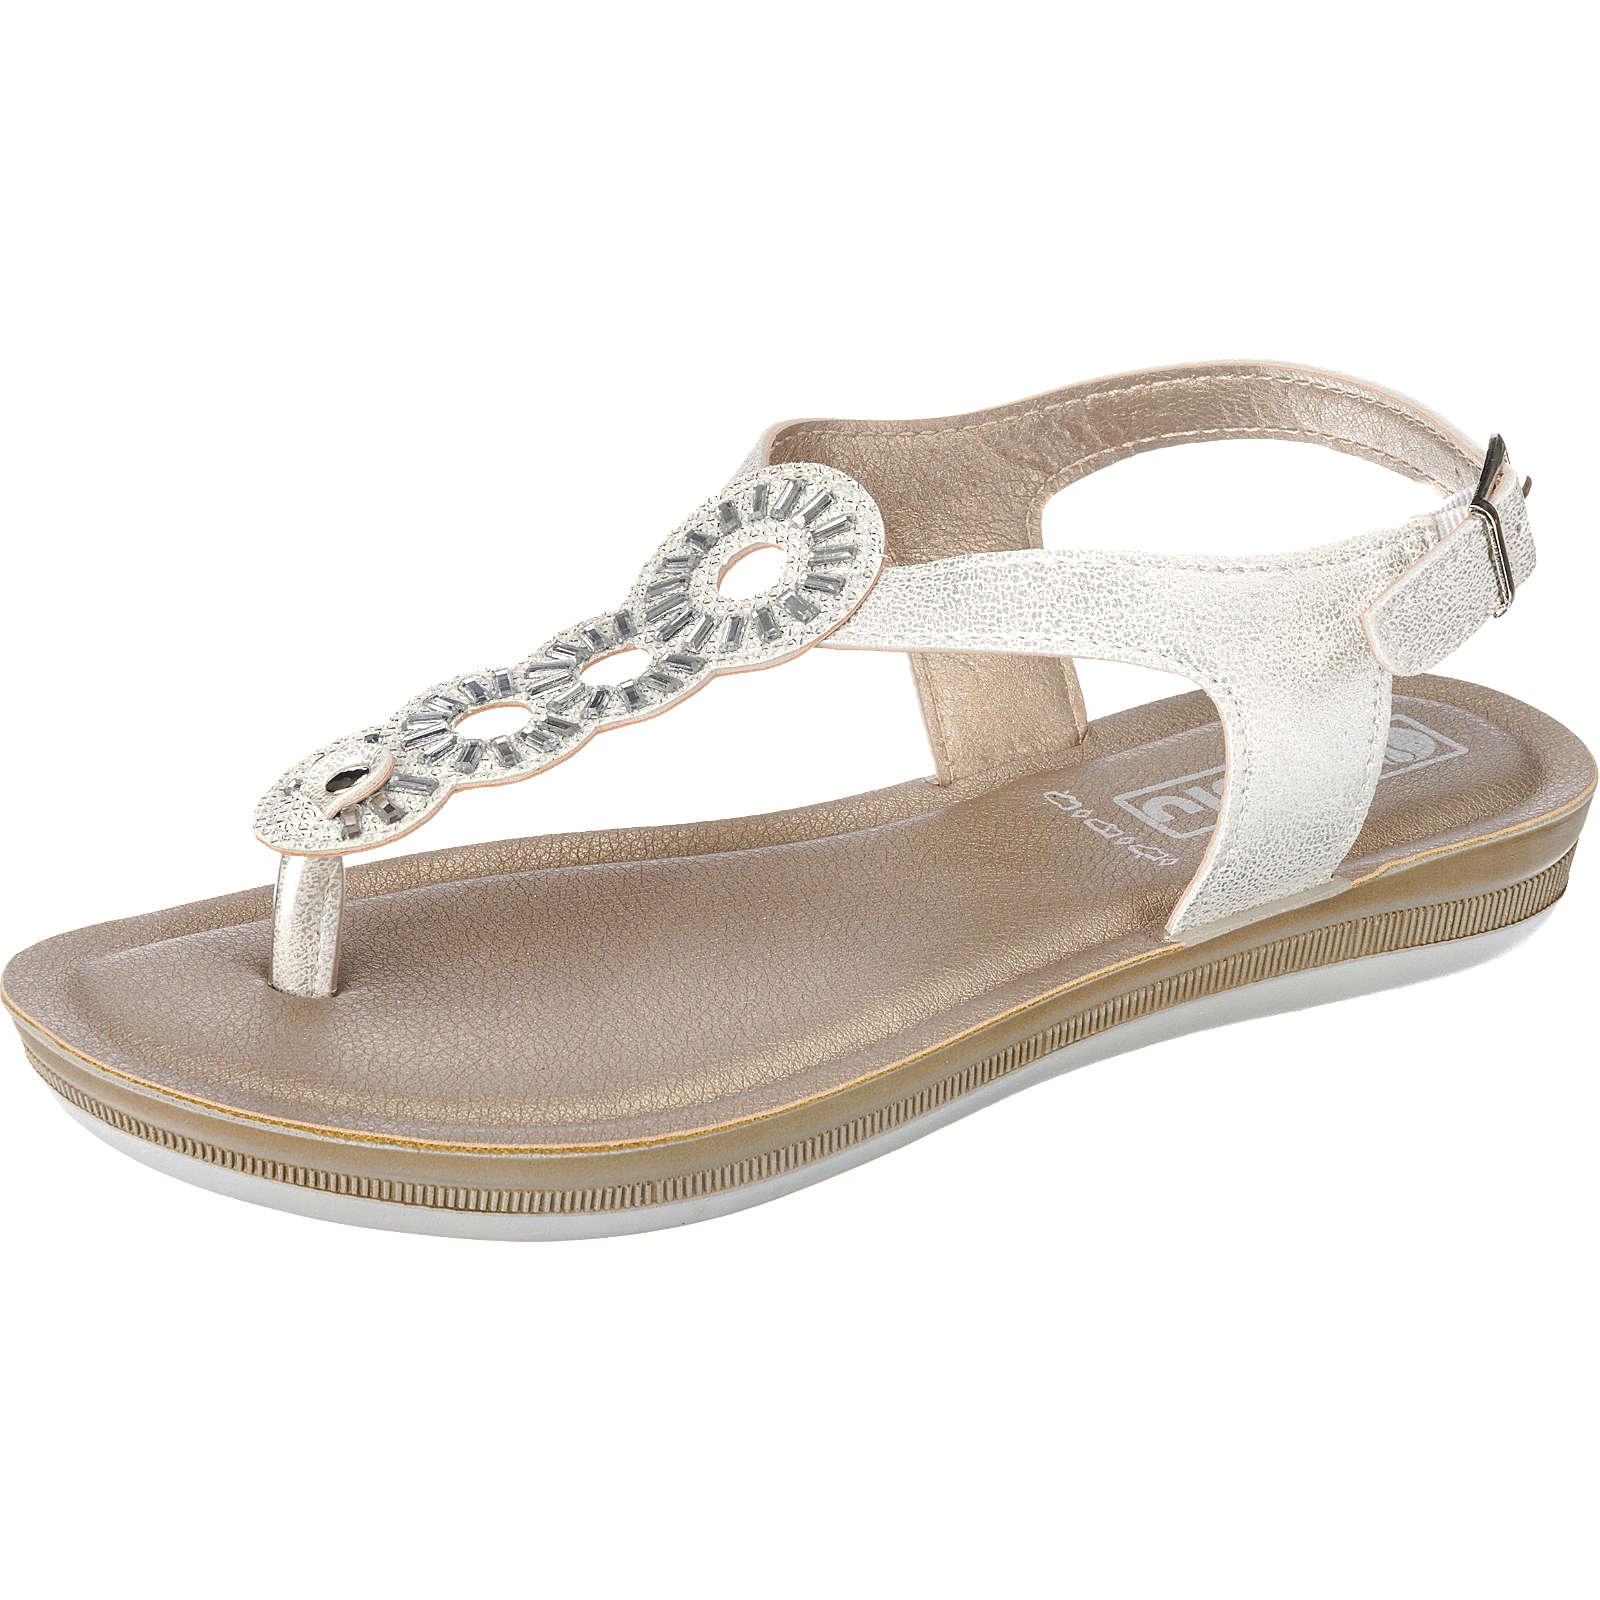 INBLU BA000006 Klassische Sandalen weiß Damen Gr. 38